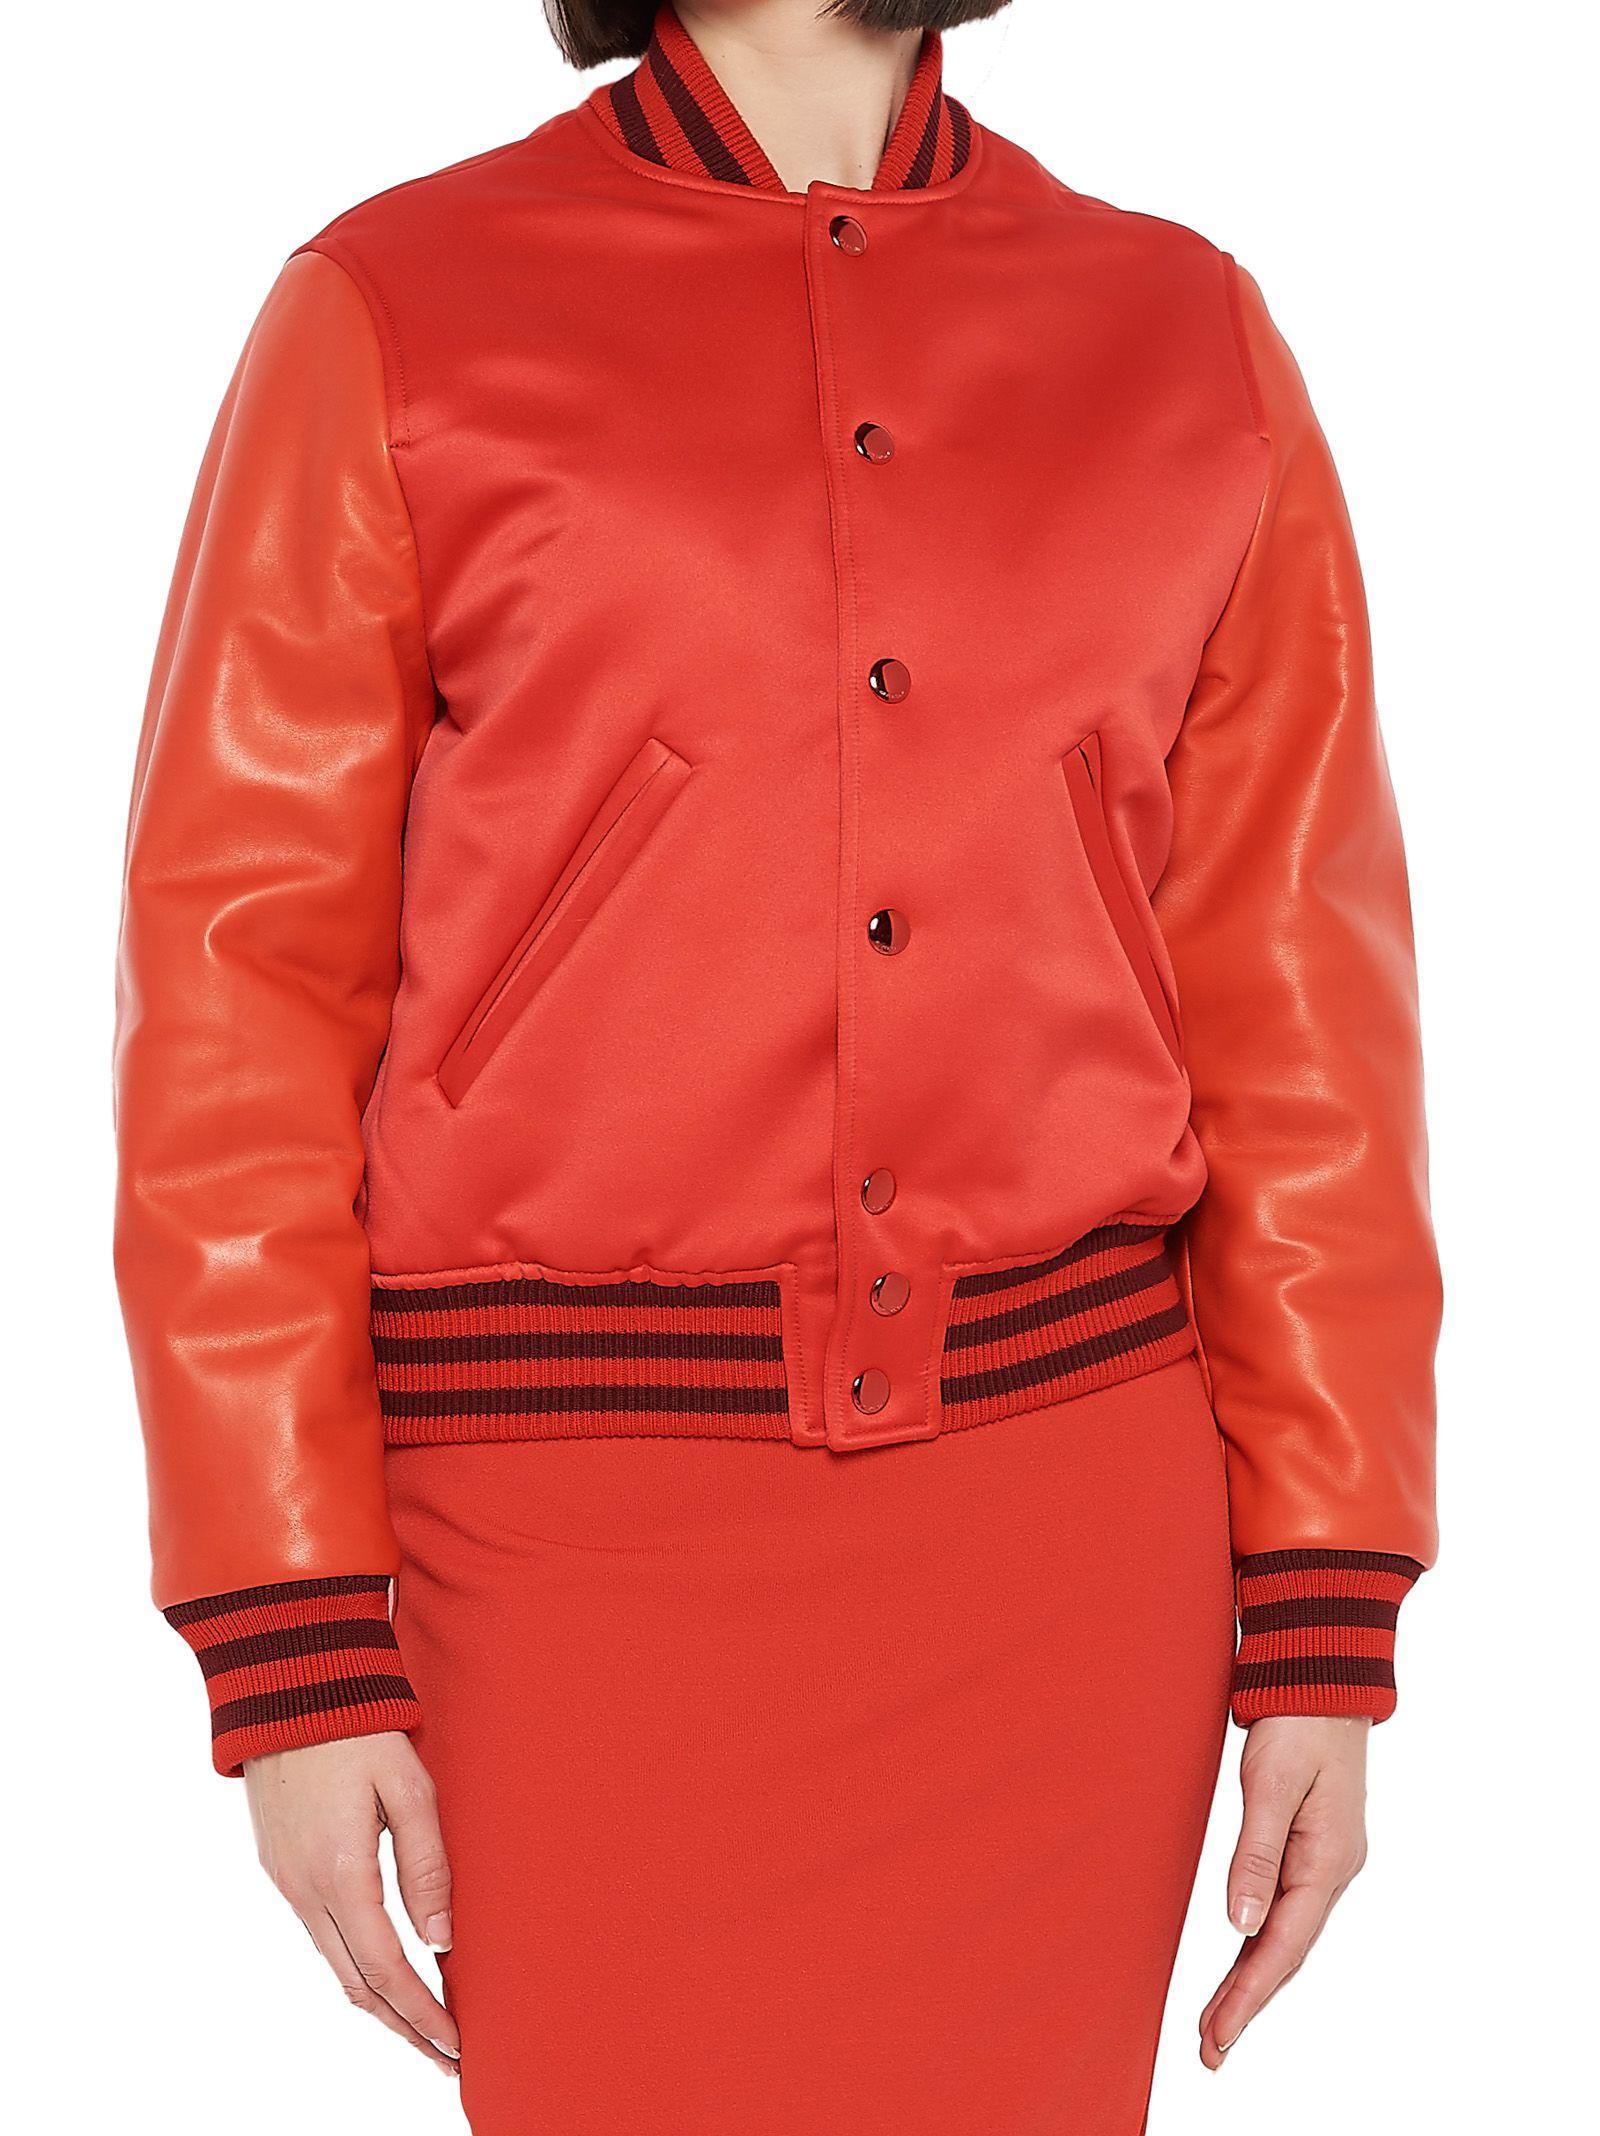 Wonderlijk Givenchy Duchesse Satin & Leather Bomber Jacket In Red | ModeSens HV-12